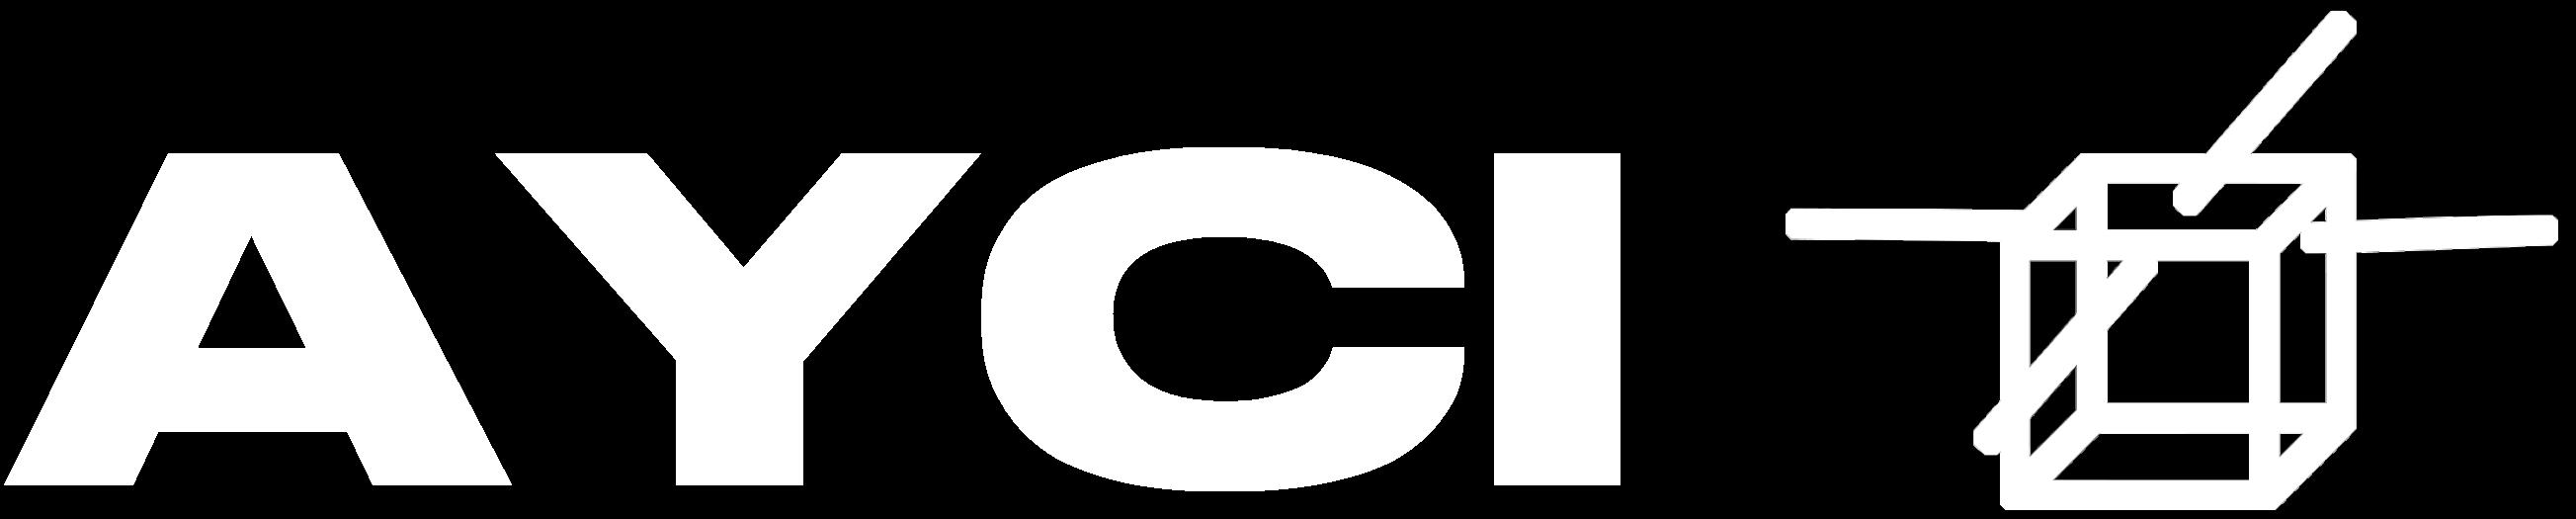 Australasian Youth Cubesat Initiative